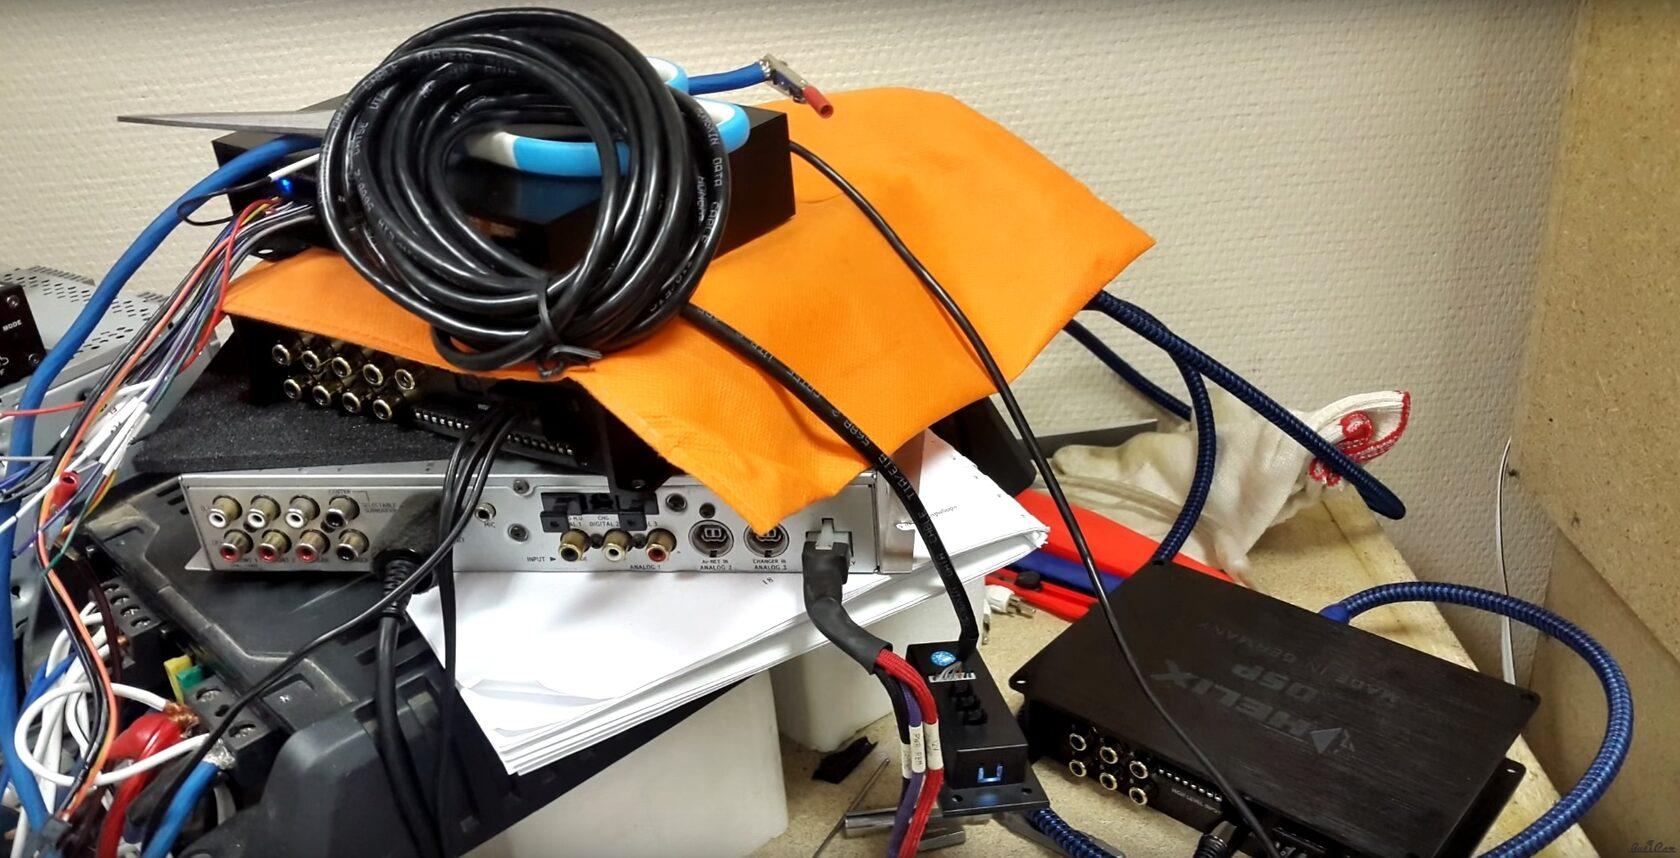 алпан против хеликс аудиопроцессор